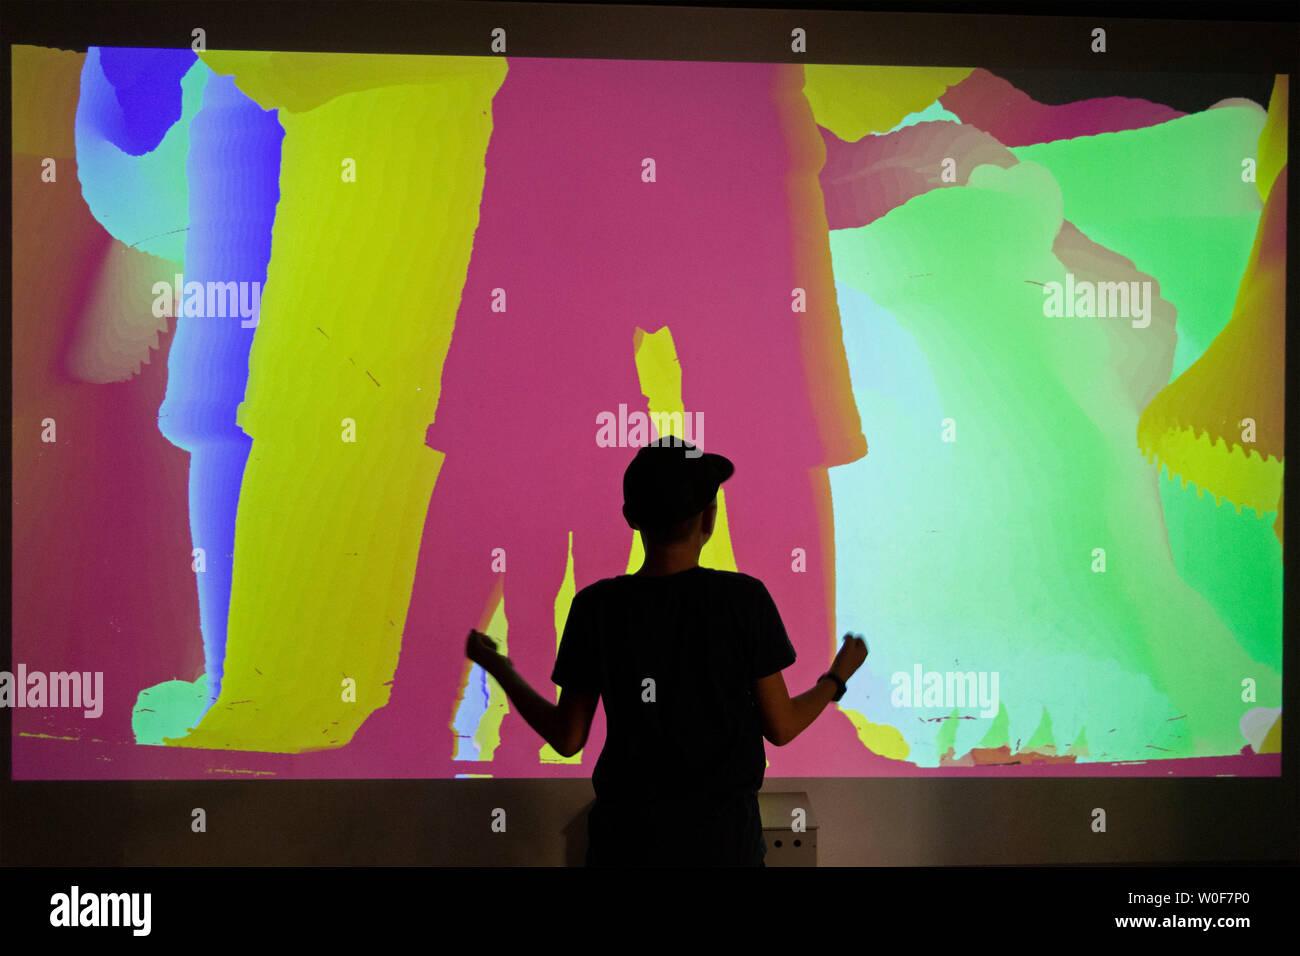 screen, Universum, Bremen, Germany - Stock Image